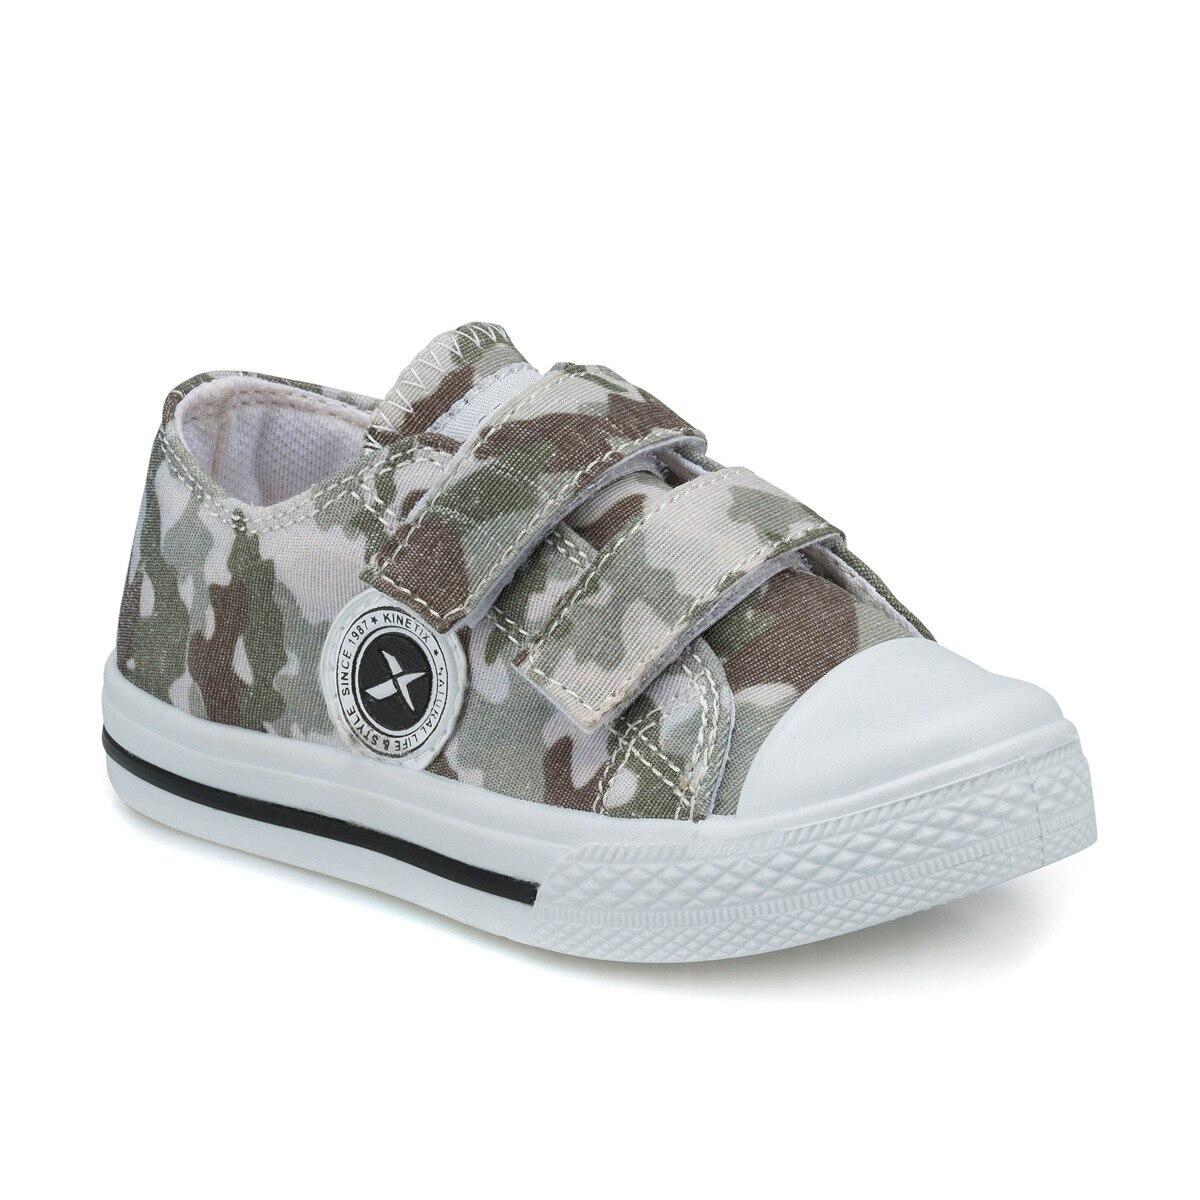 FLO ARM Khaki Male Child Sneaker Shoes KINETIX